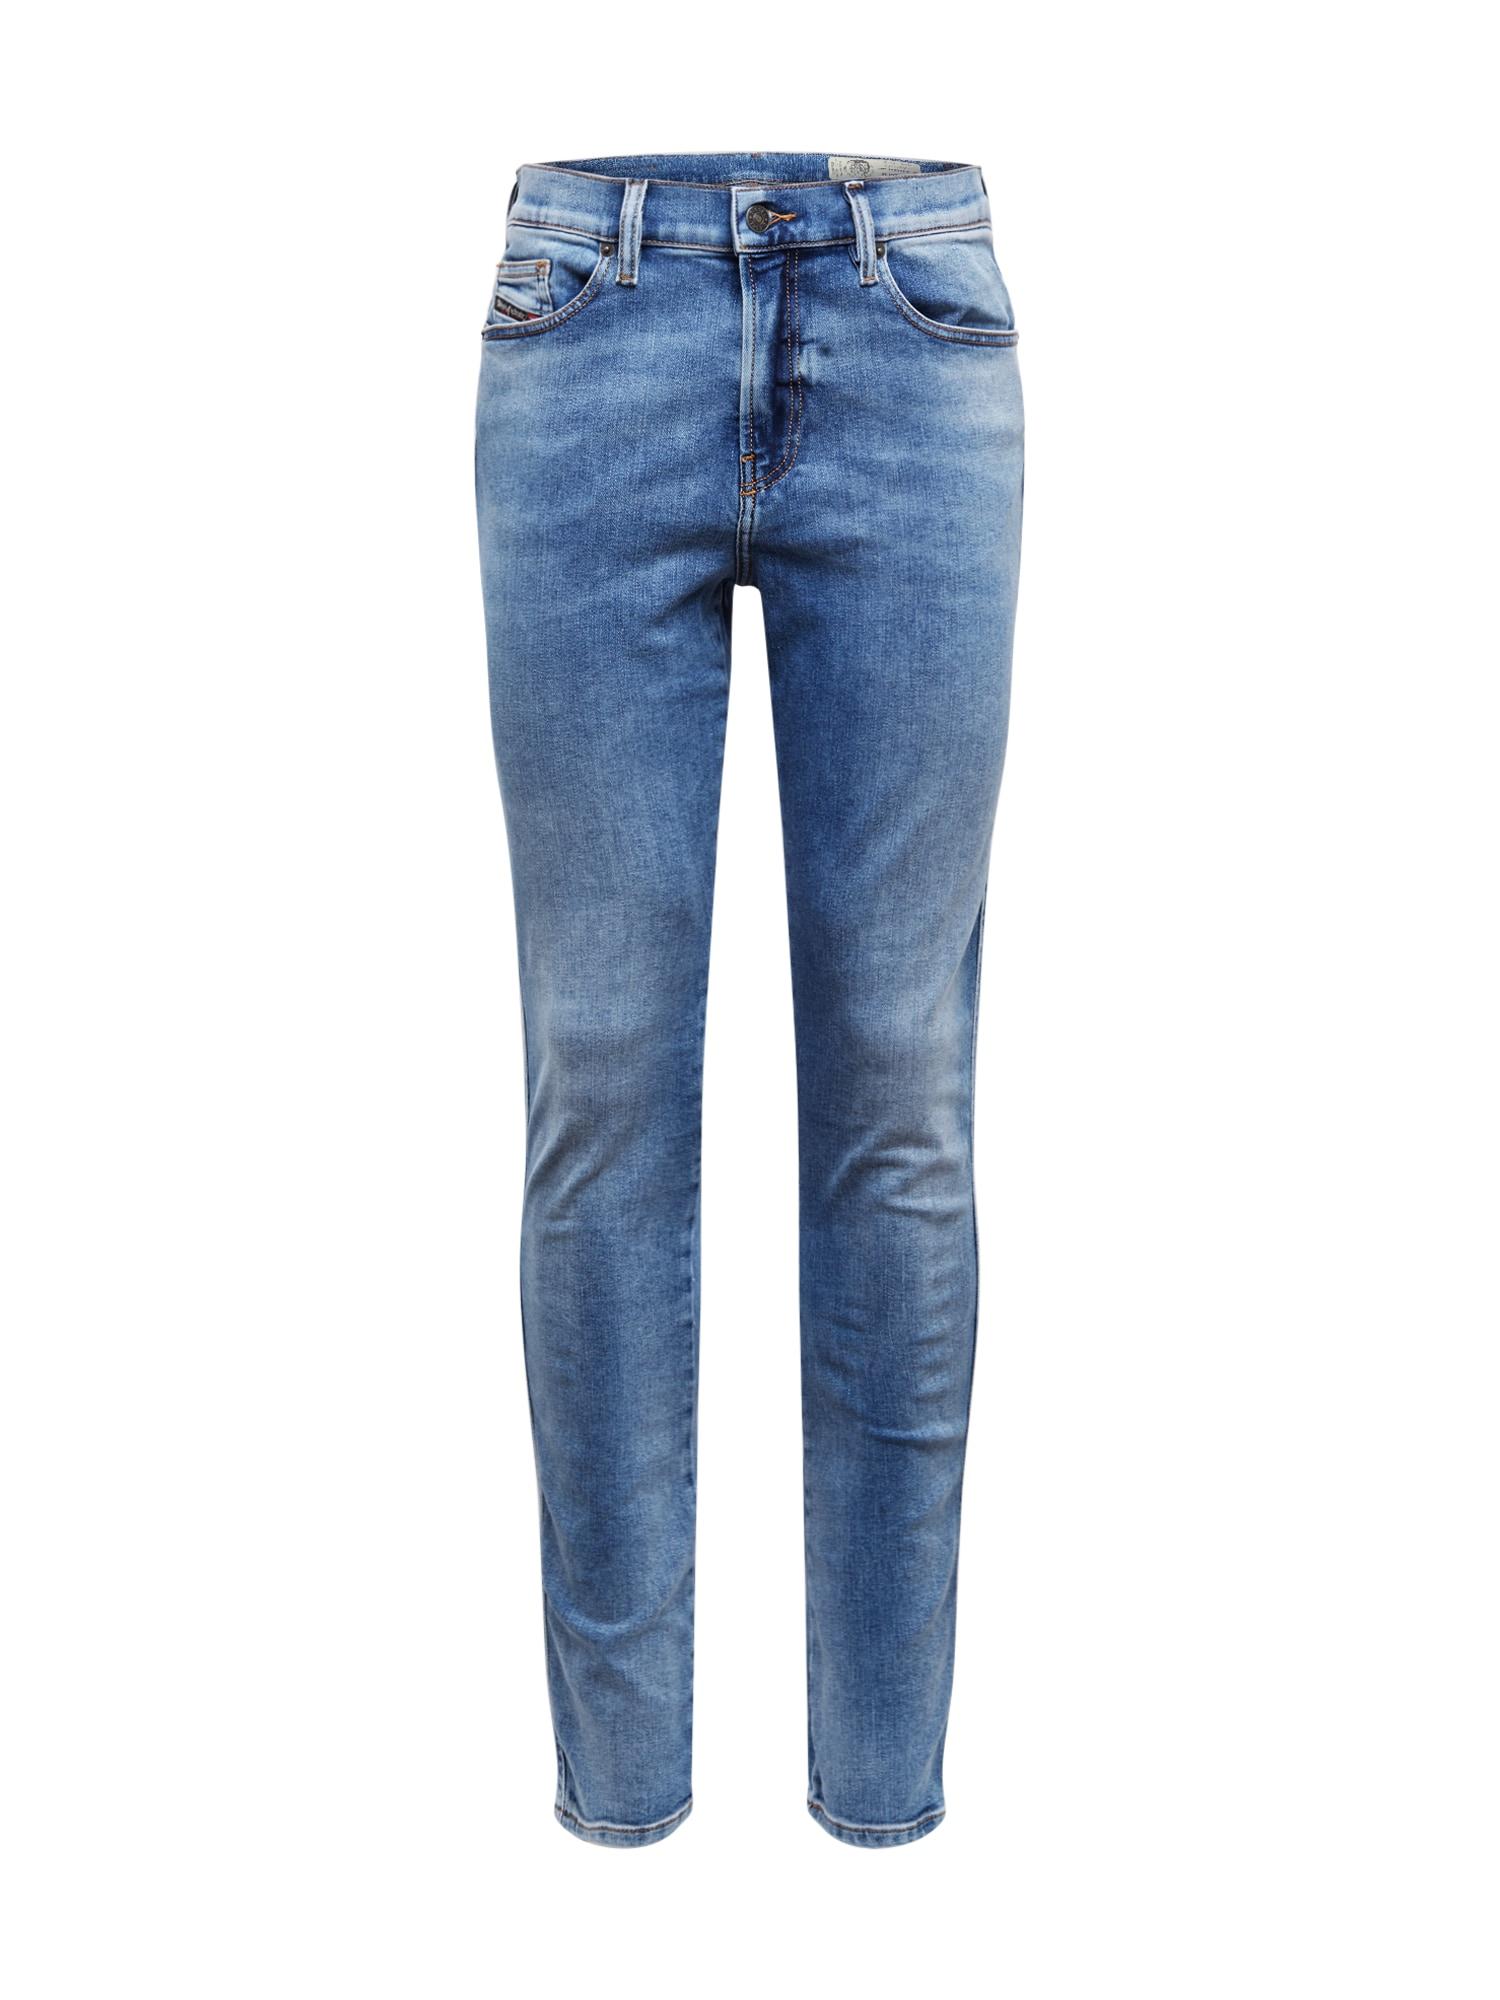 DIESEL Džinsai 'D-ISTORT' tamsiai (džinso) mėlyna